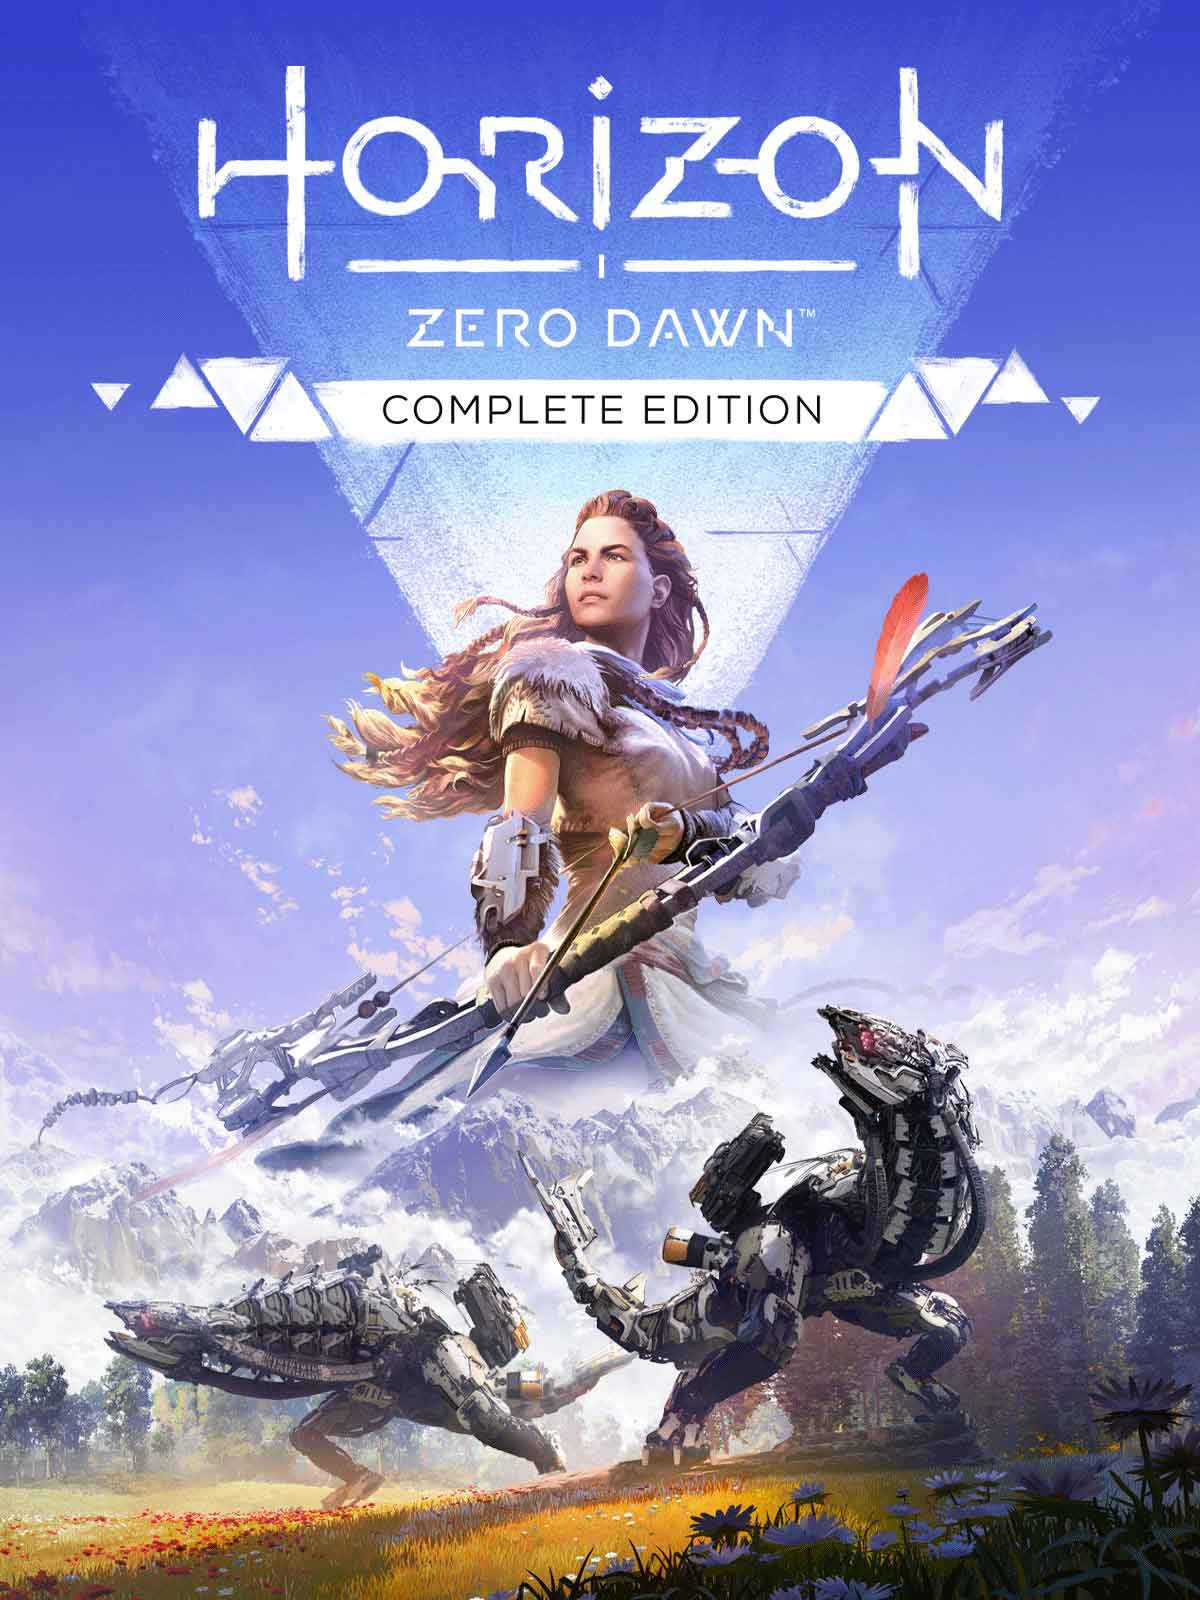 Microsoft State Of Decay 2 Juggernaut Edition PC Game